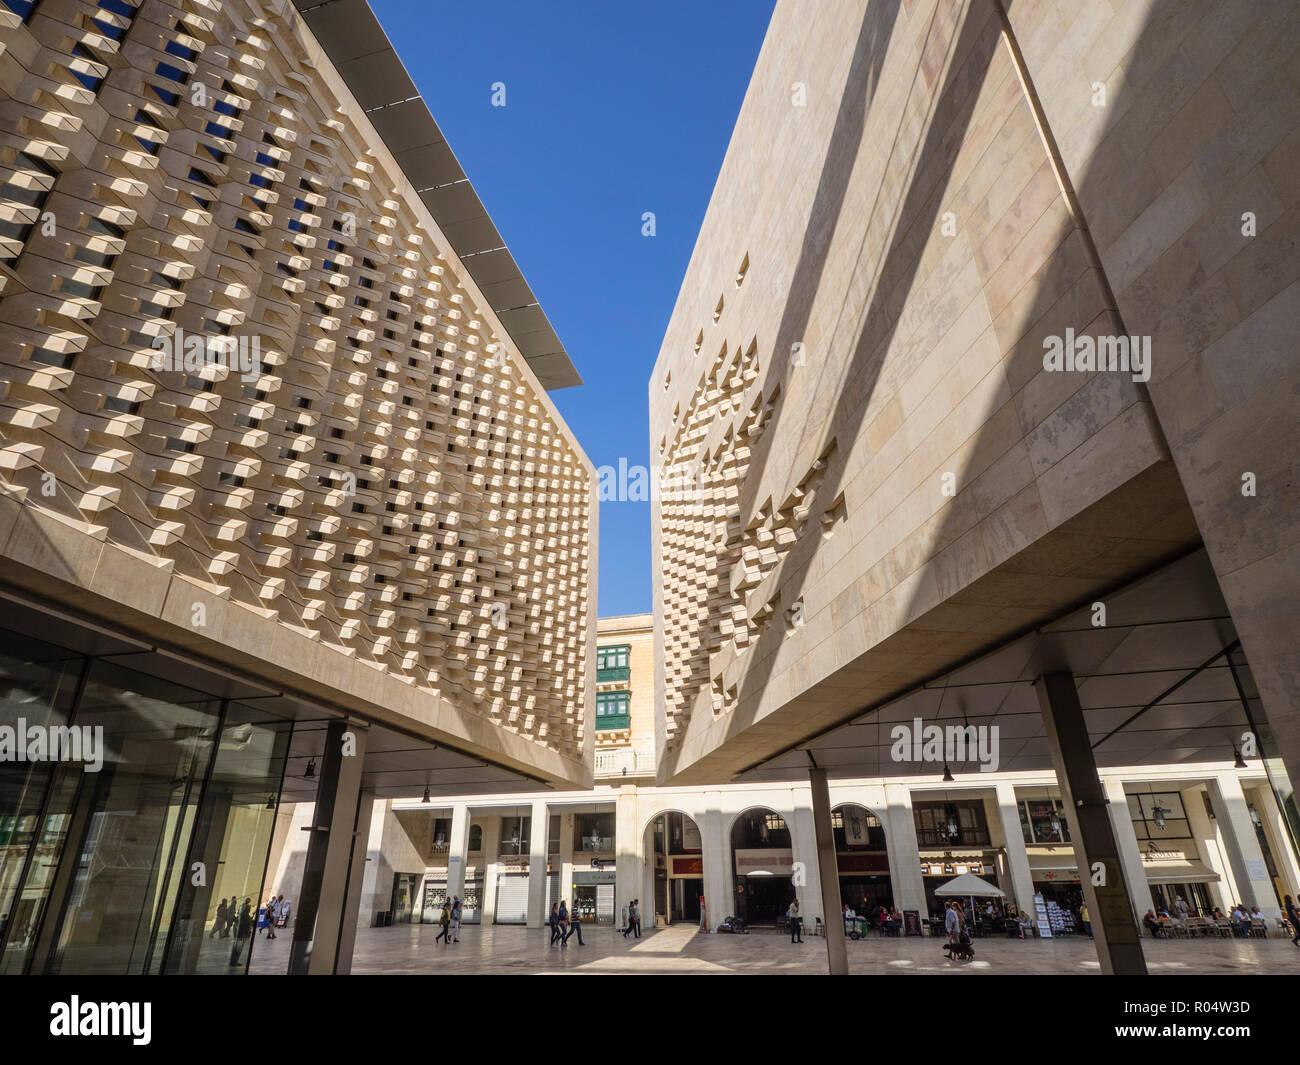 The new Parliament Building designed by Renzo Piano, Valletta, Malta, Europe - Stock Image